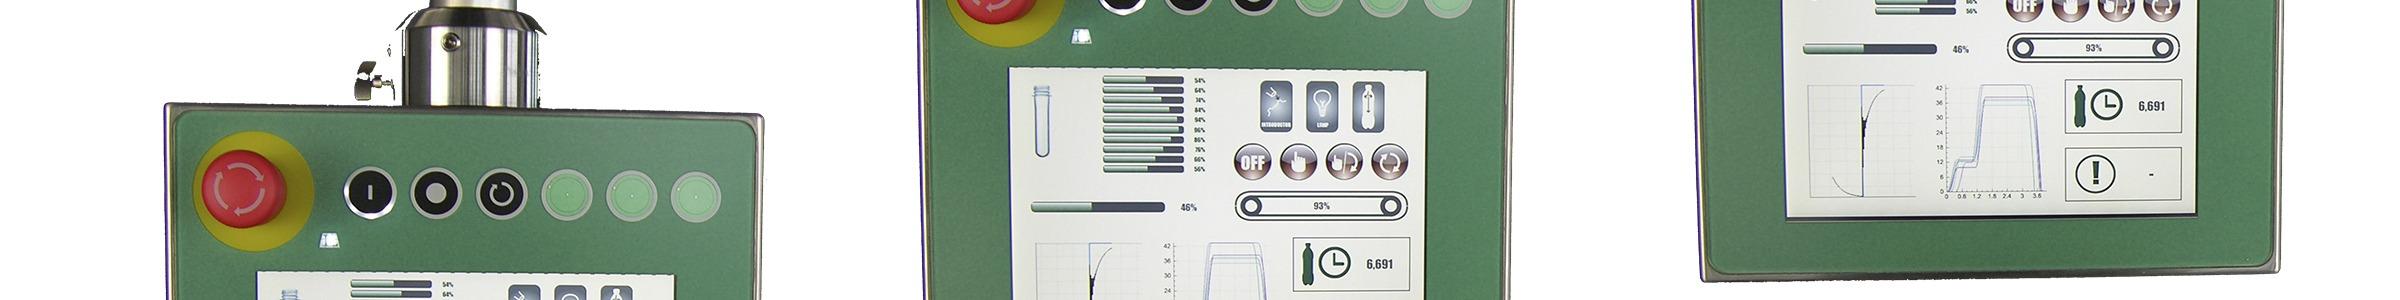 HIPC: controladores industriales higienizables de Larraioz Elektronika